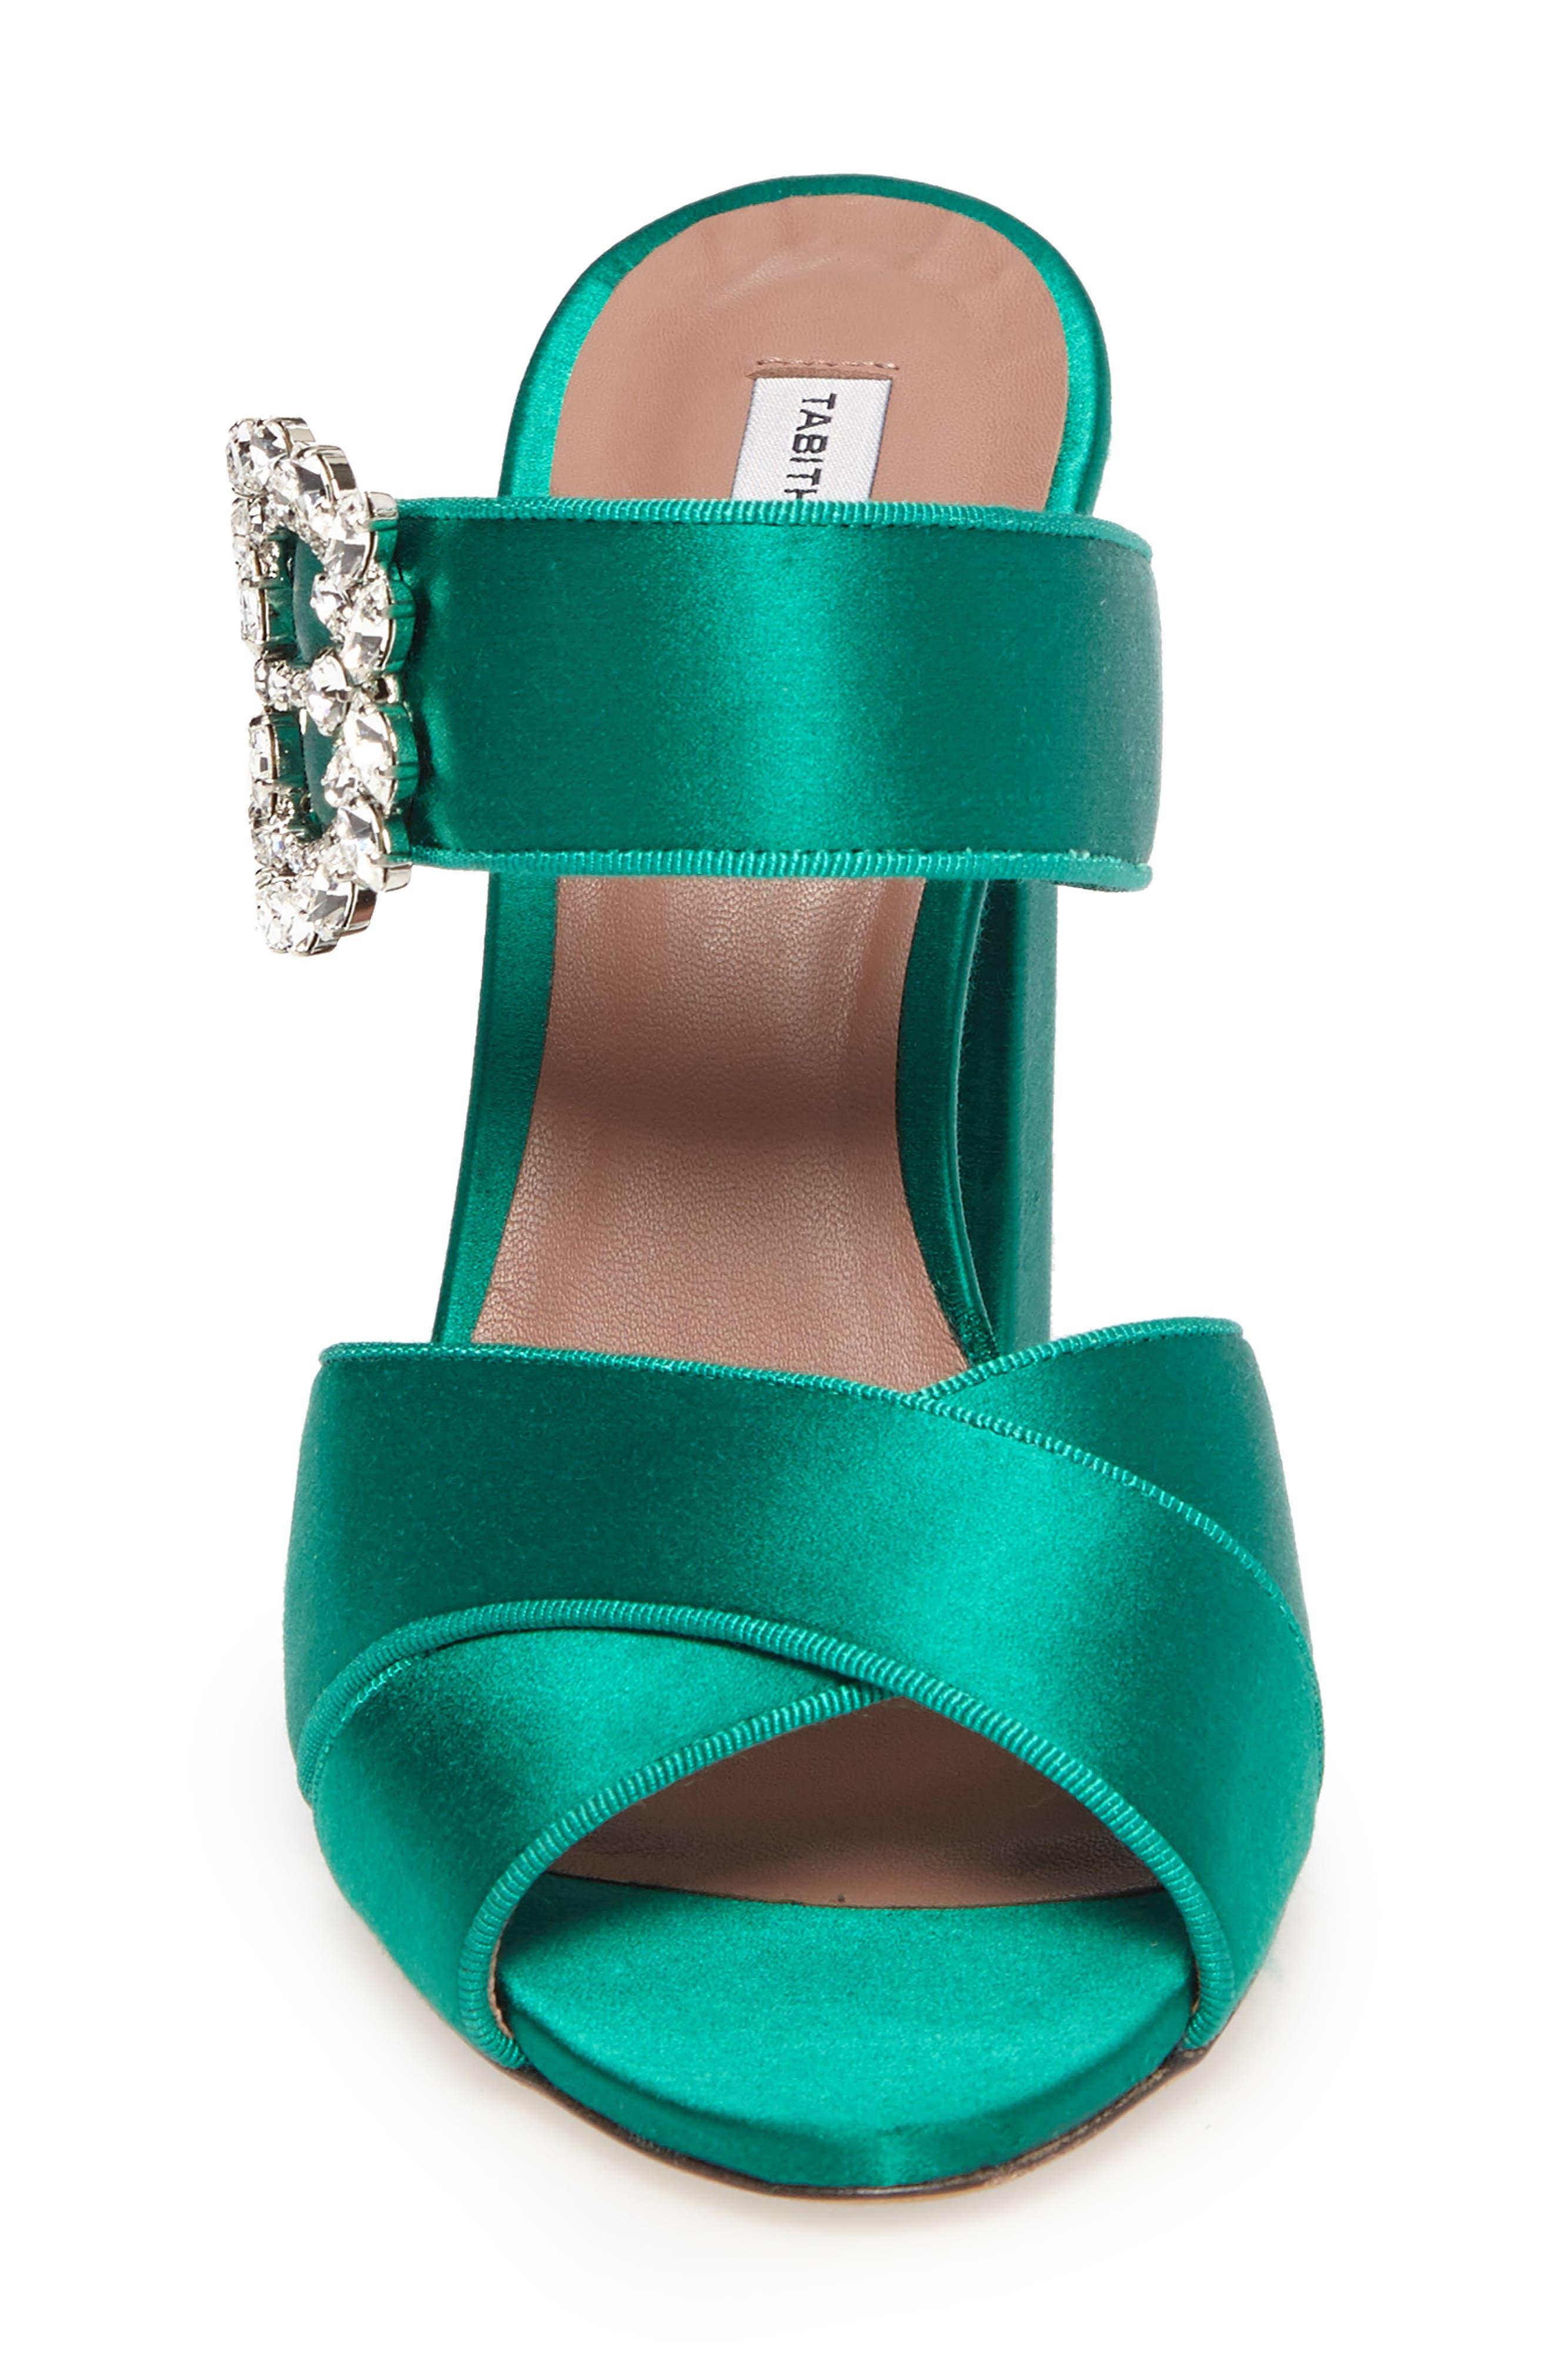 Reyner Crystal Buckle Sandal,                             Alternate thumbnail 4, color,                             Emerald Green